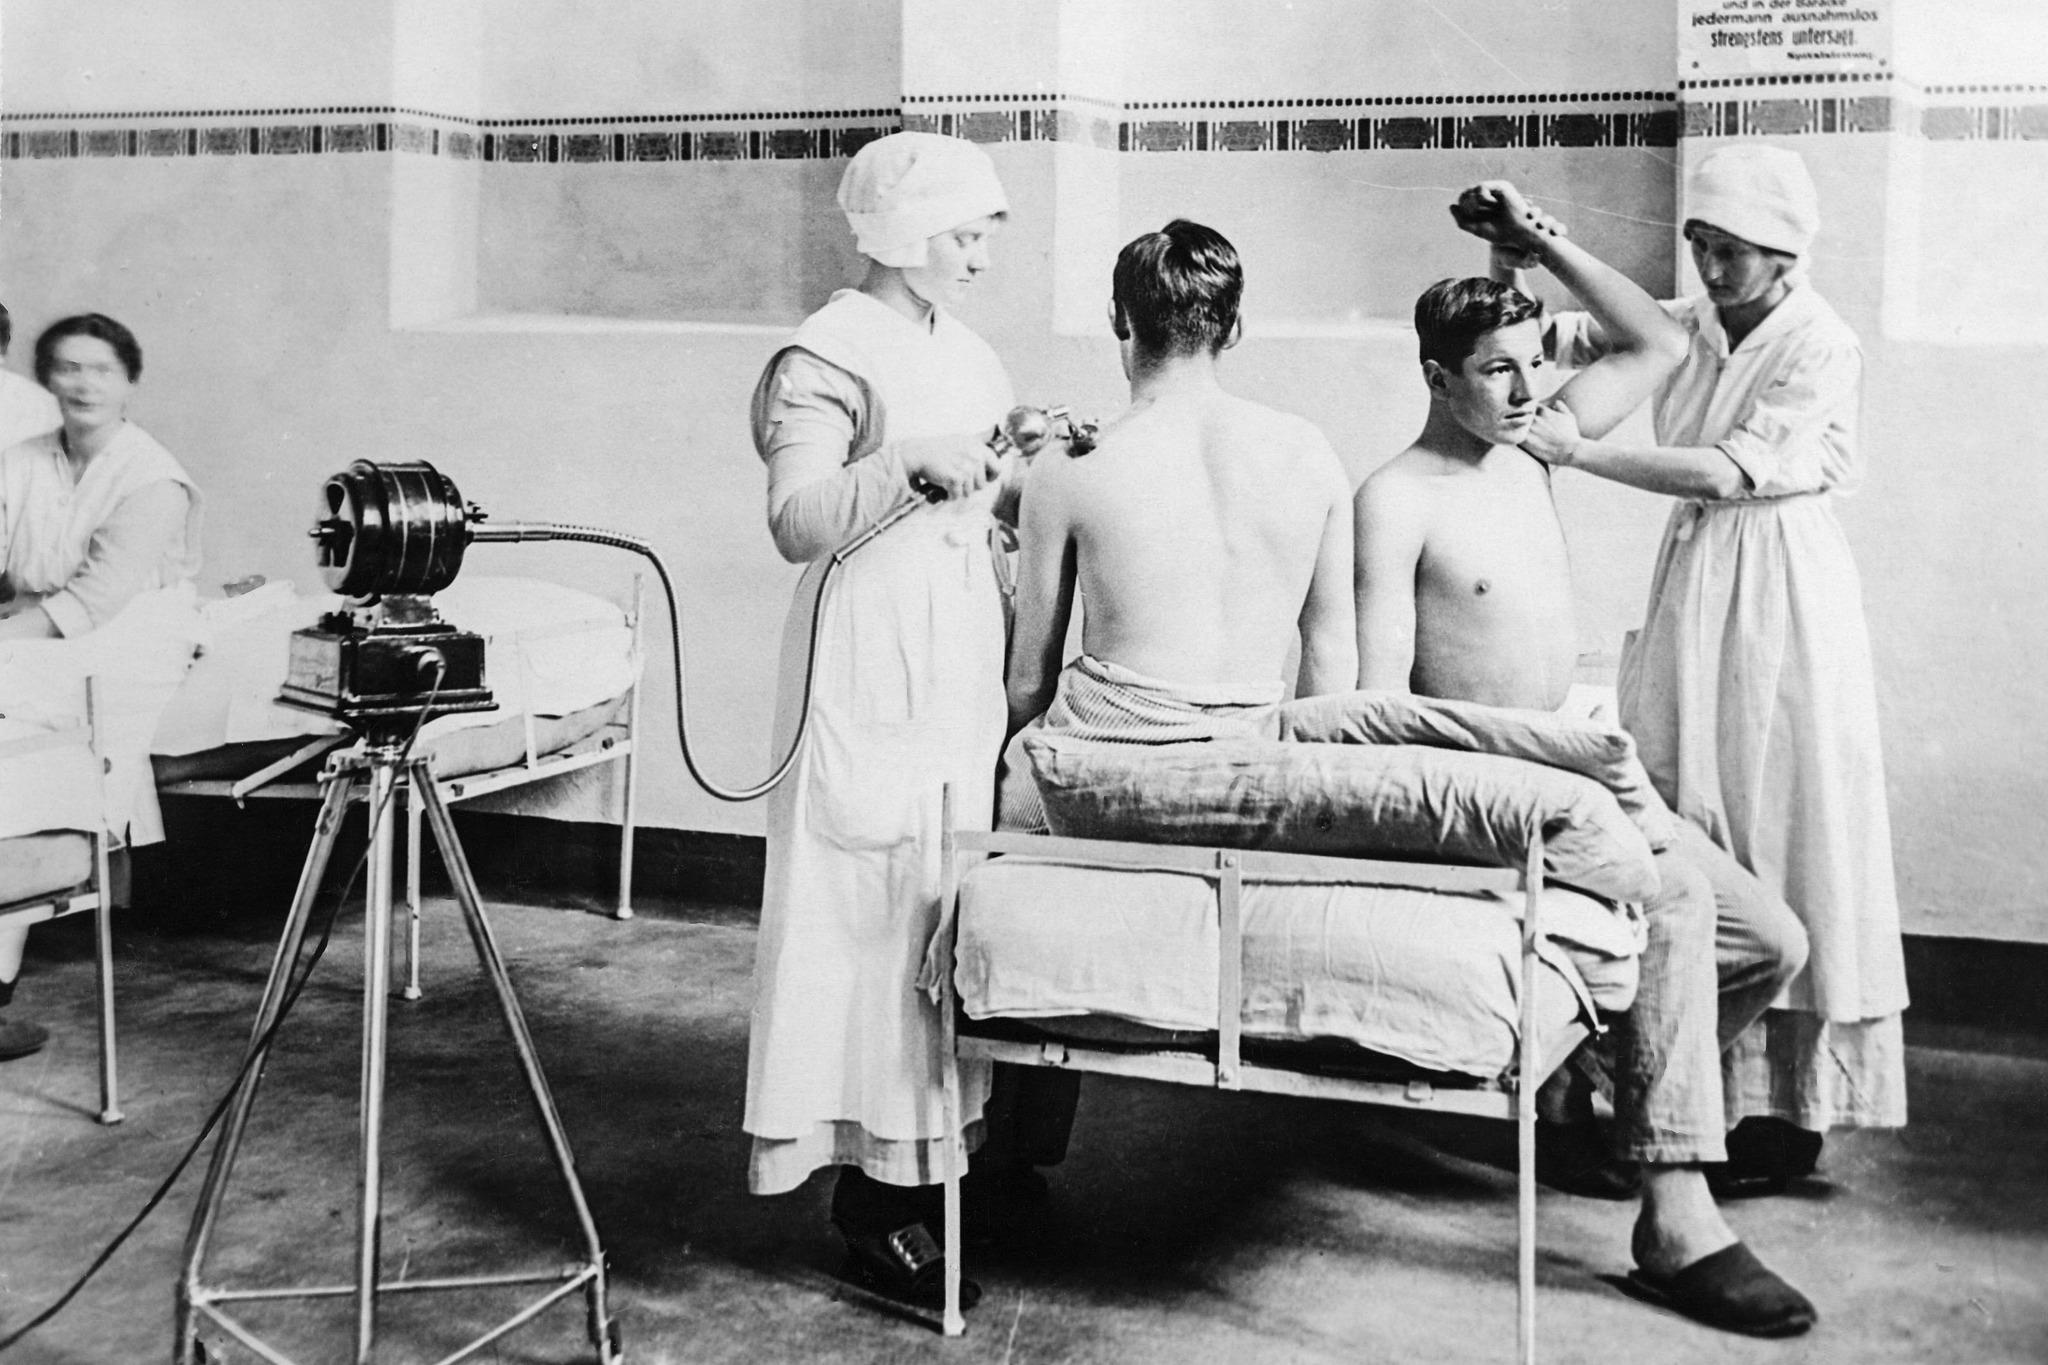 Frauen im 1. Weltkrieg - Kitzbühel